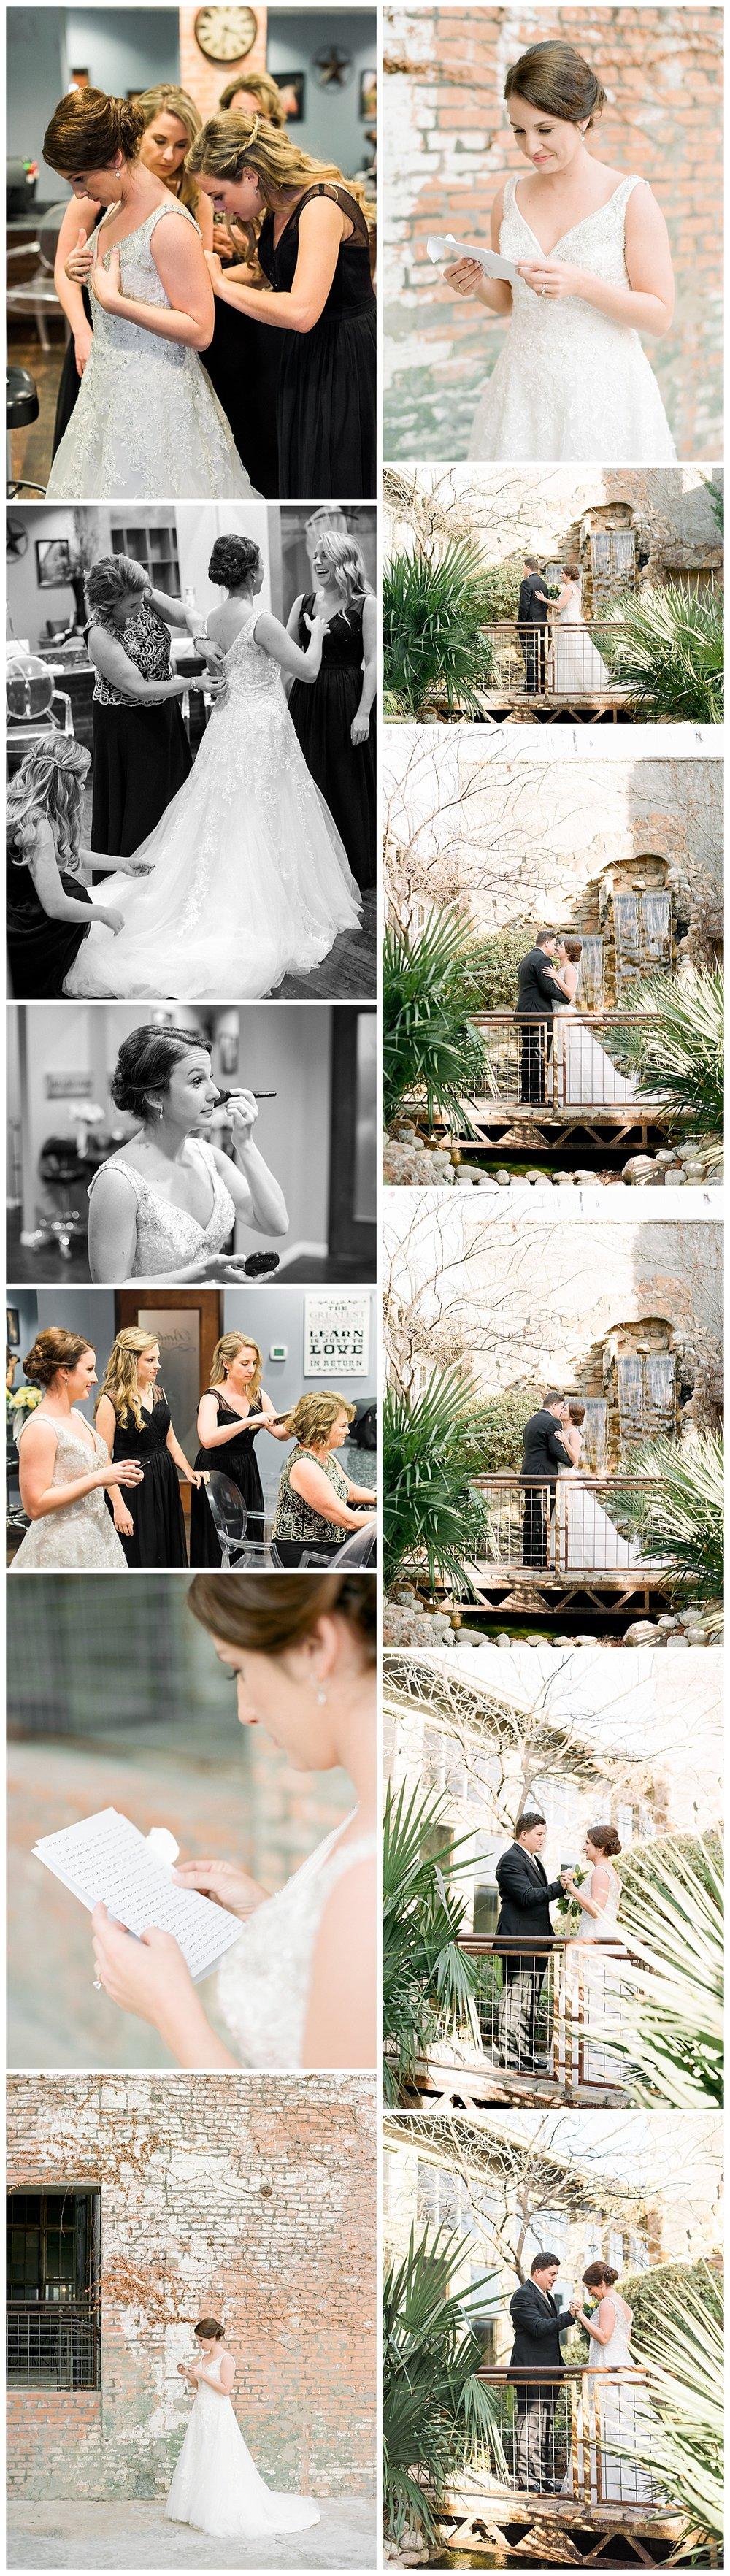 the-cotton-mill-wedding-ar-photography-4.jpg